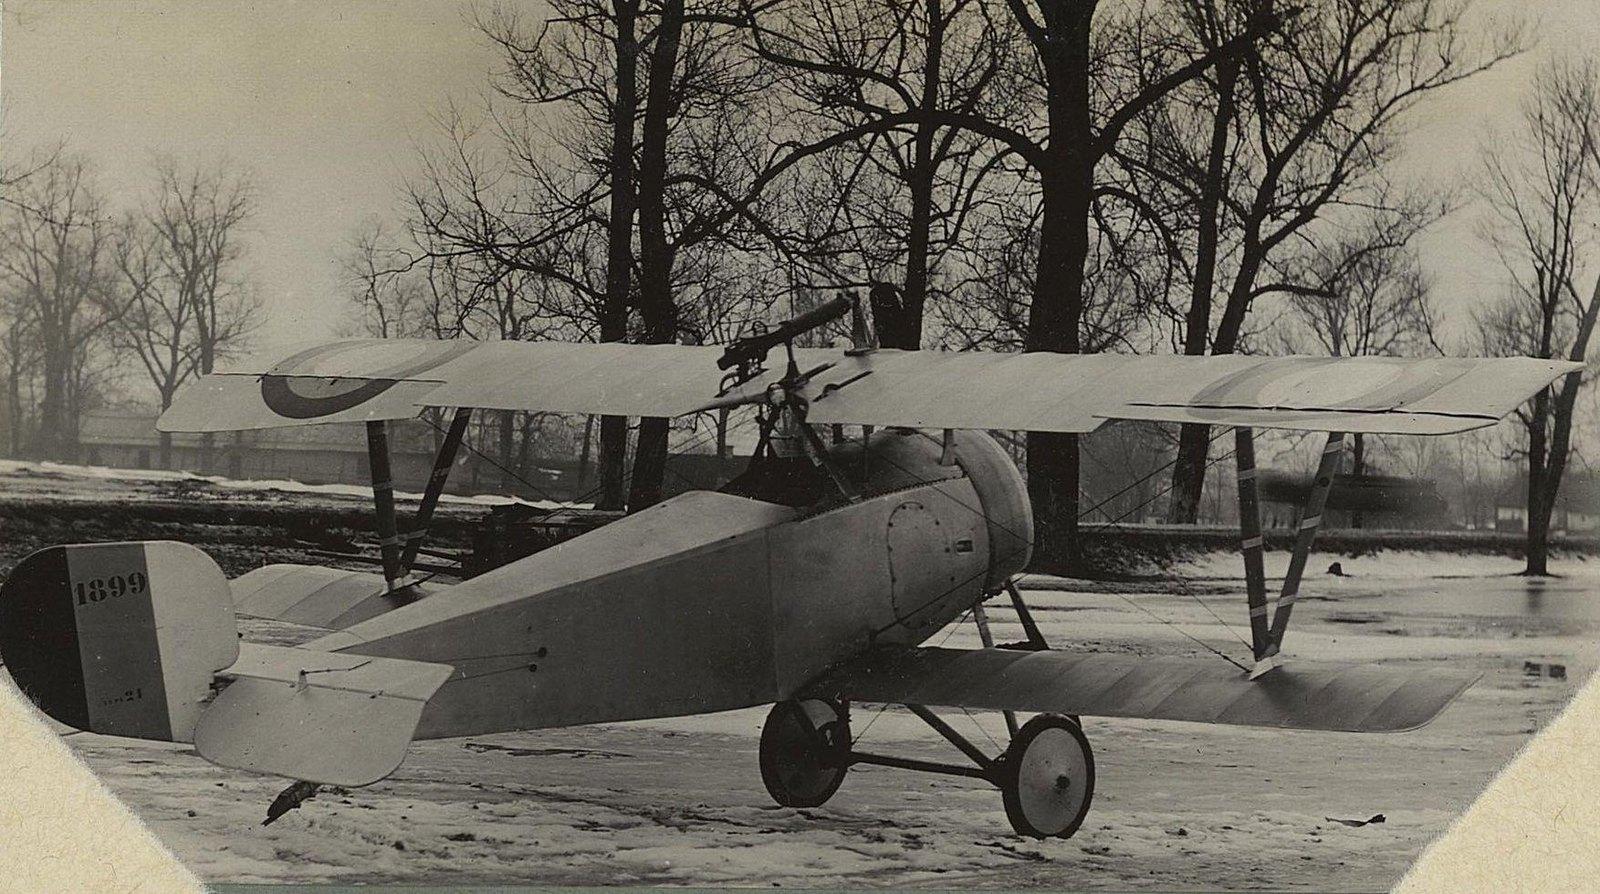 1915. Самолёт № 1899 на снегу под деревьями